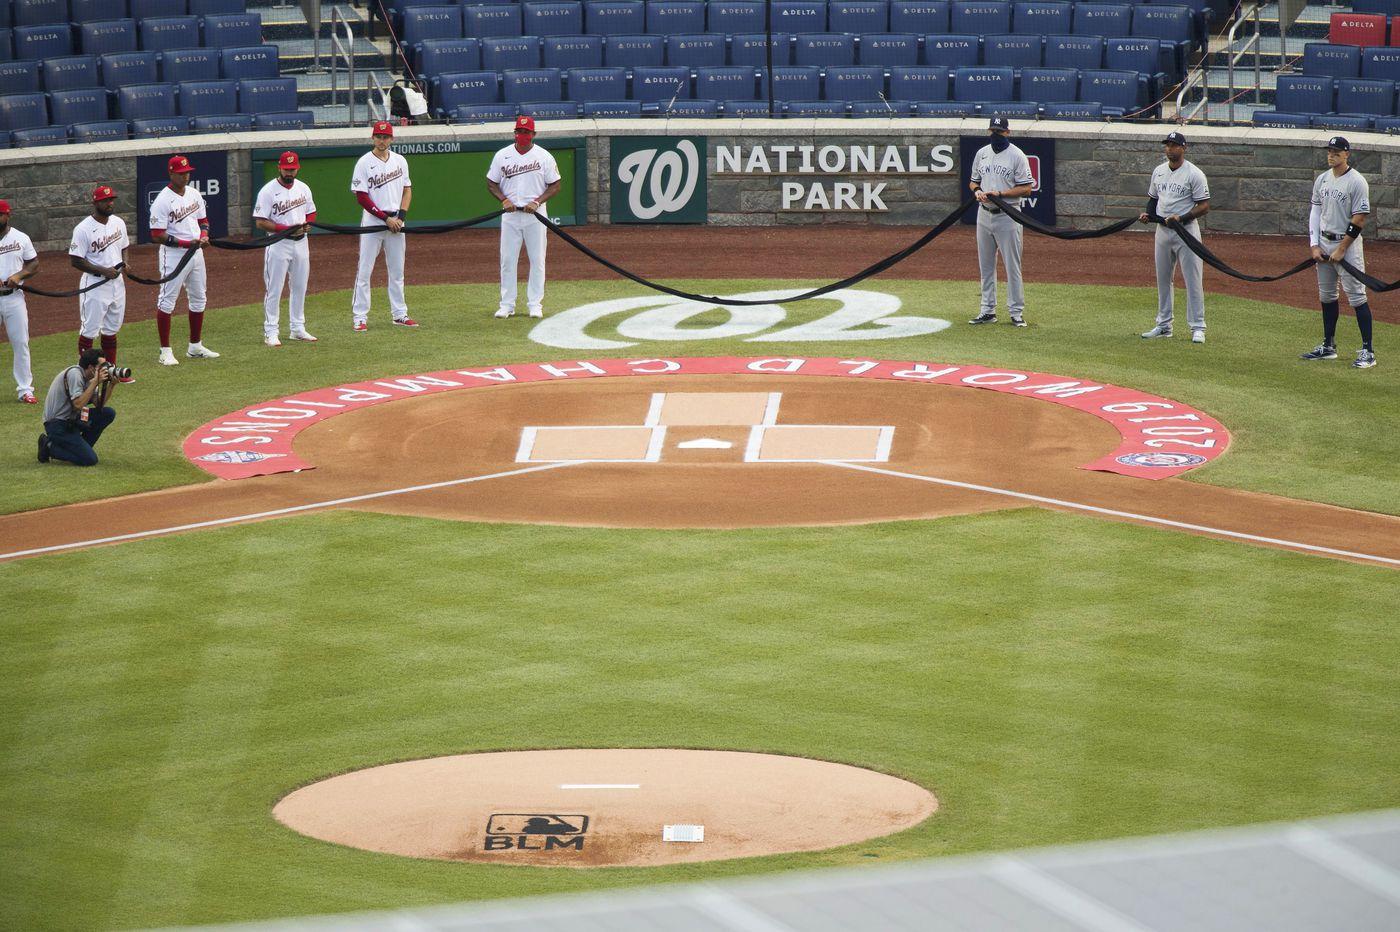 Watching baseball in an empty stadium is weirder than I thought | David Murphy